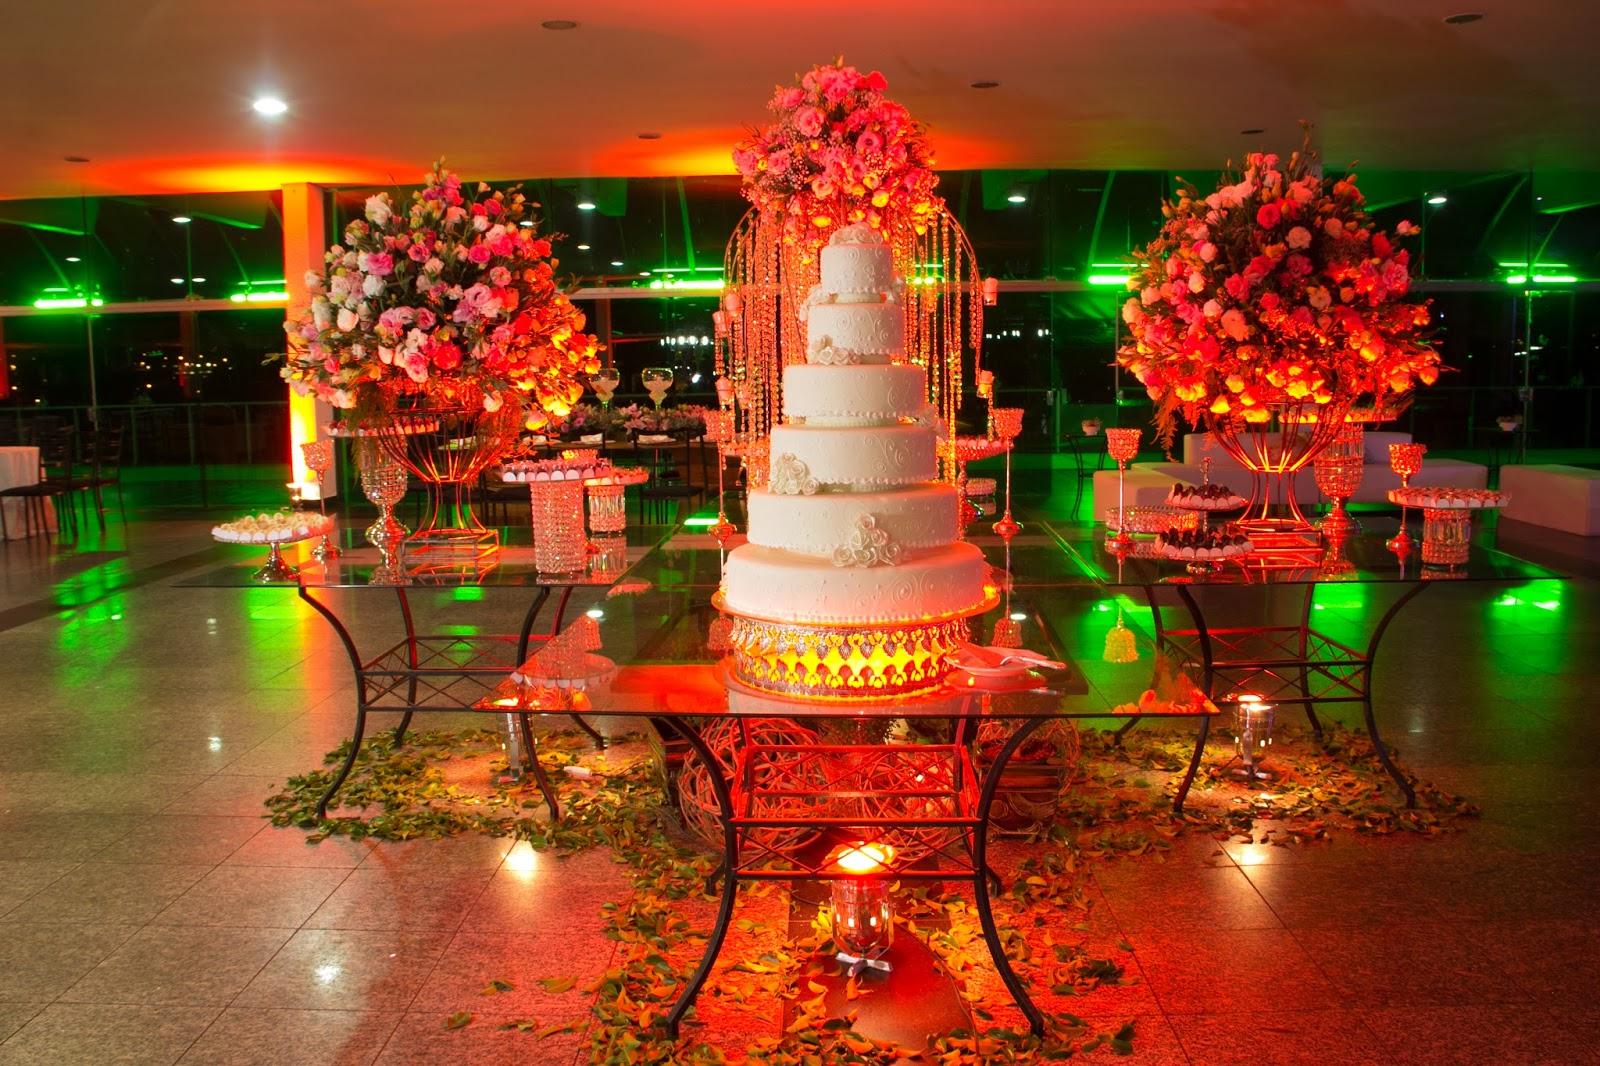 historia-amor-fe-festa-mesa-bolo